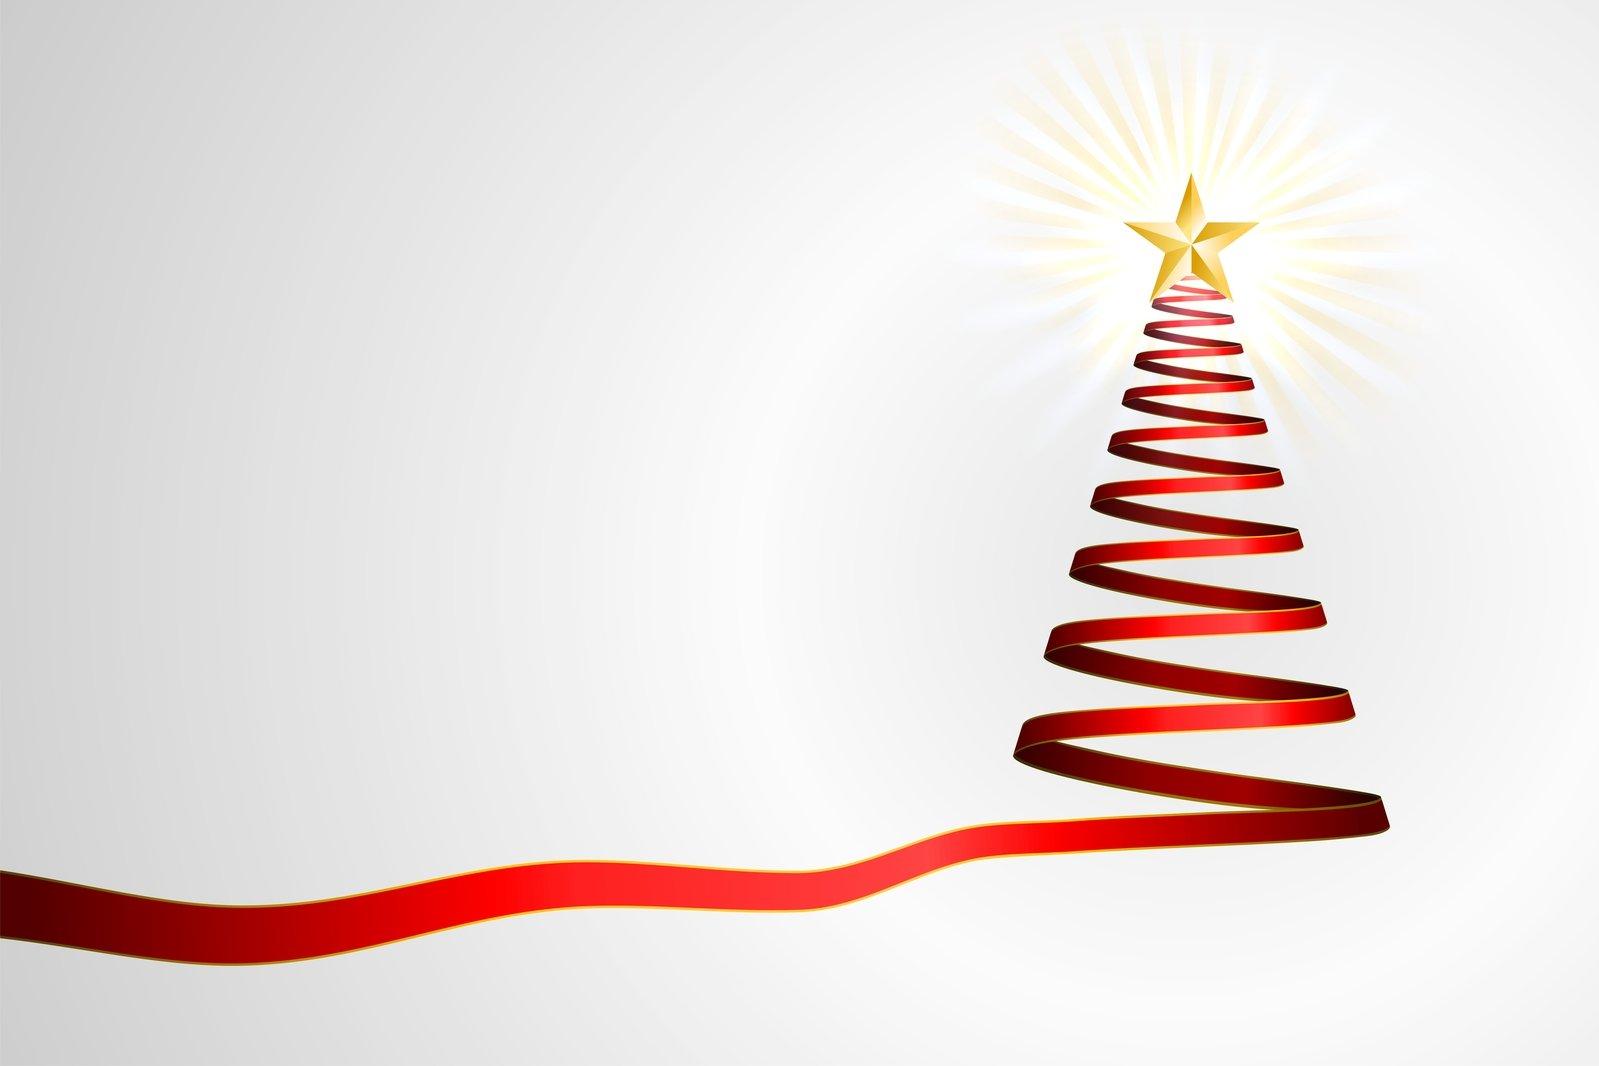 Free simple ribbon christmas tree stock photo for Using ribbon on christmas tree